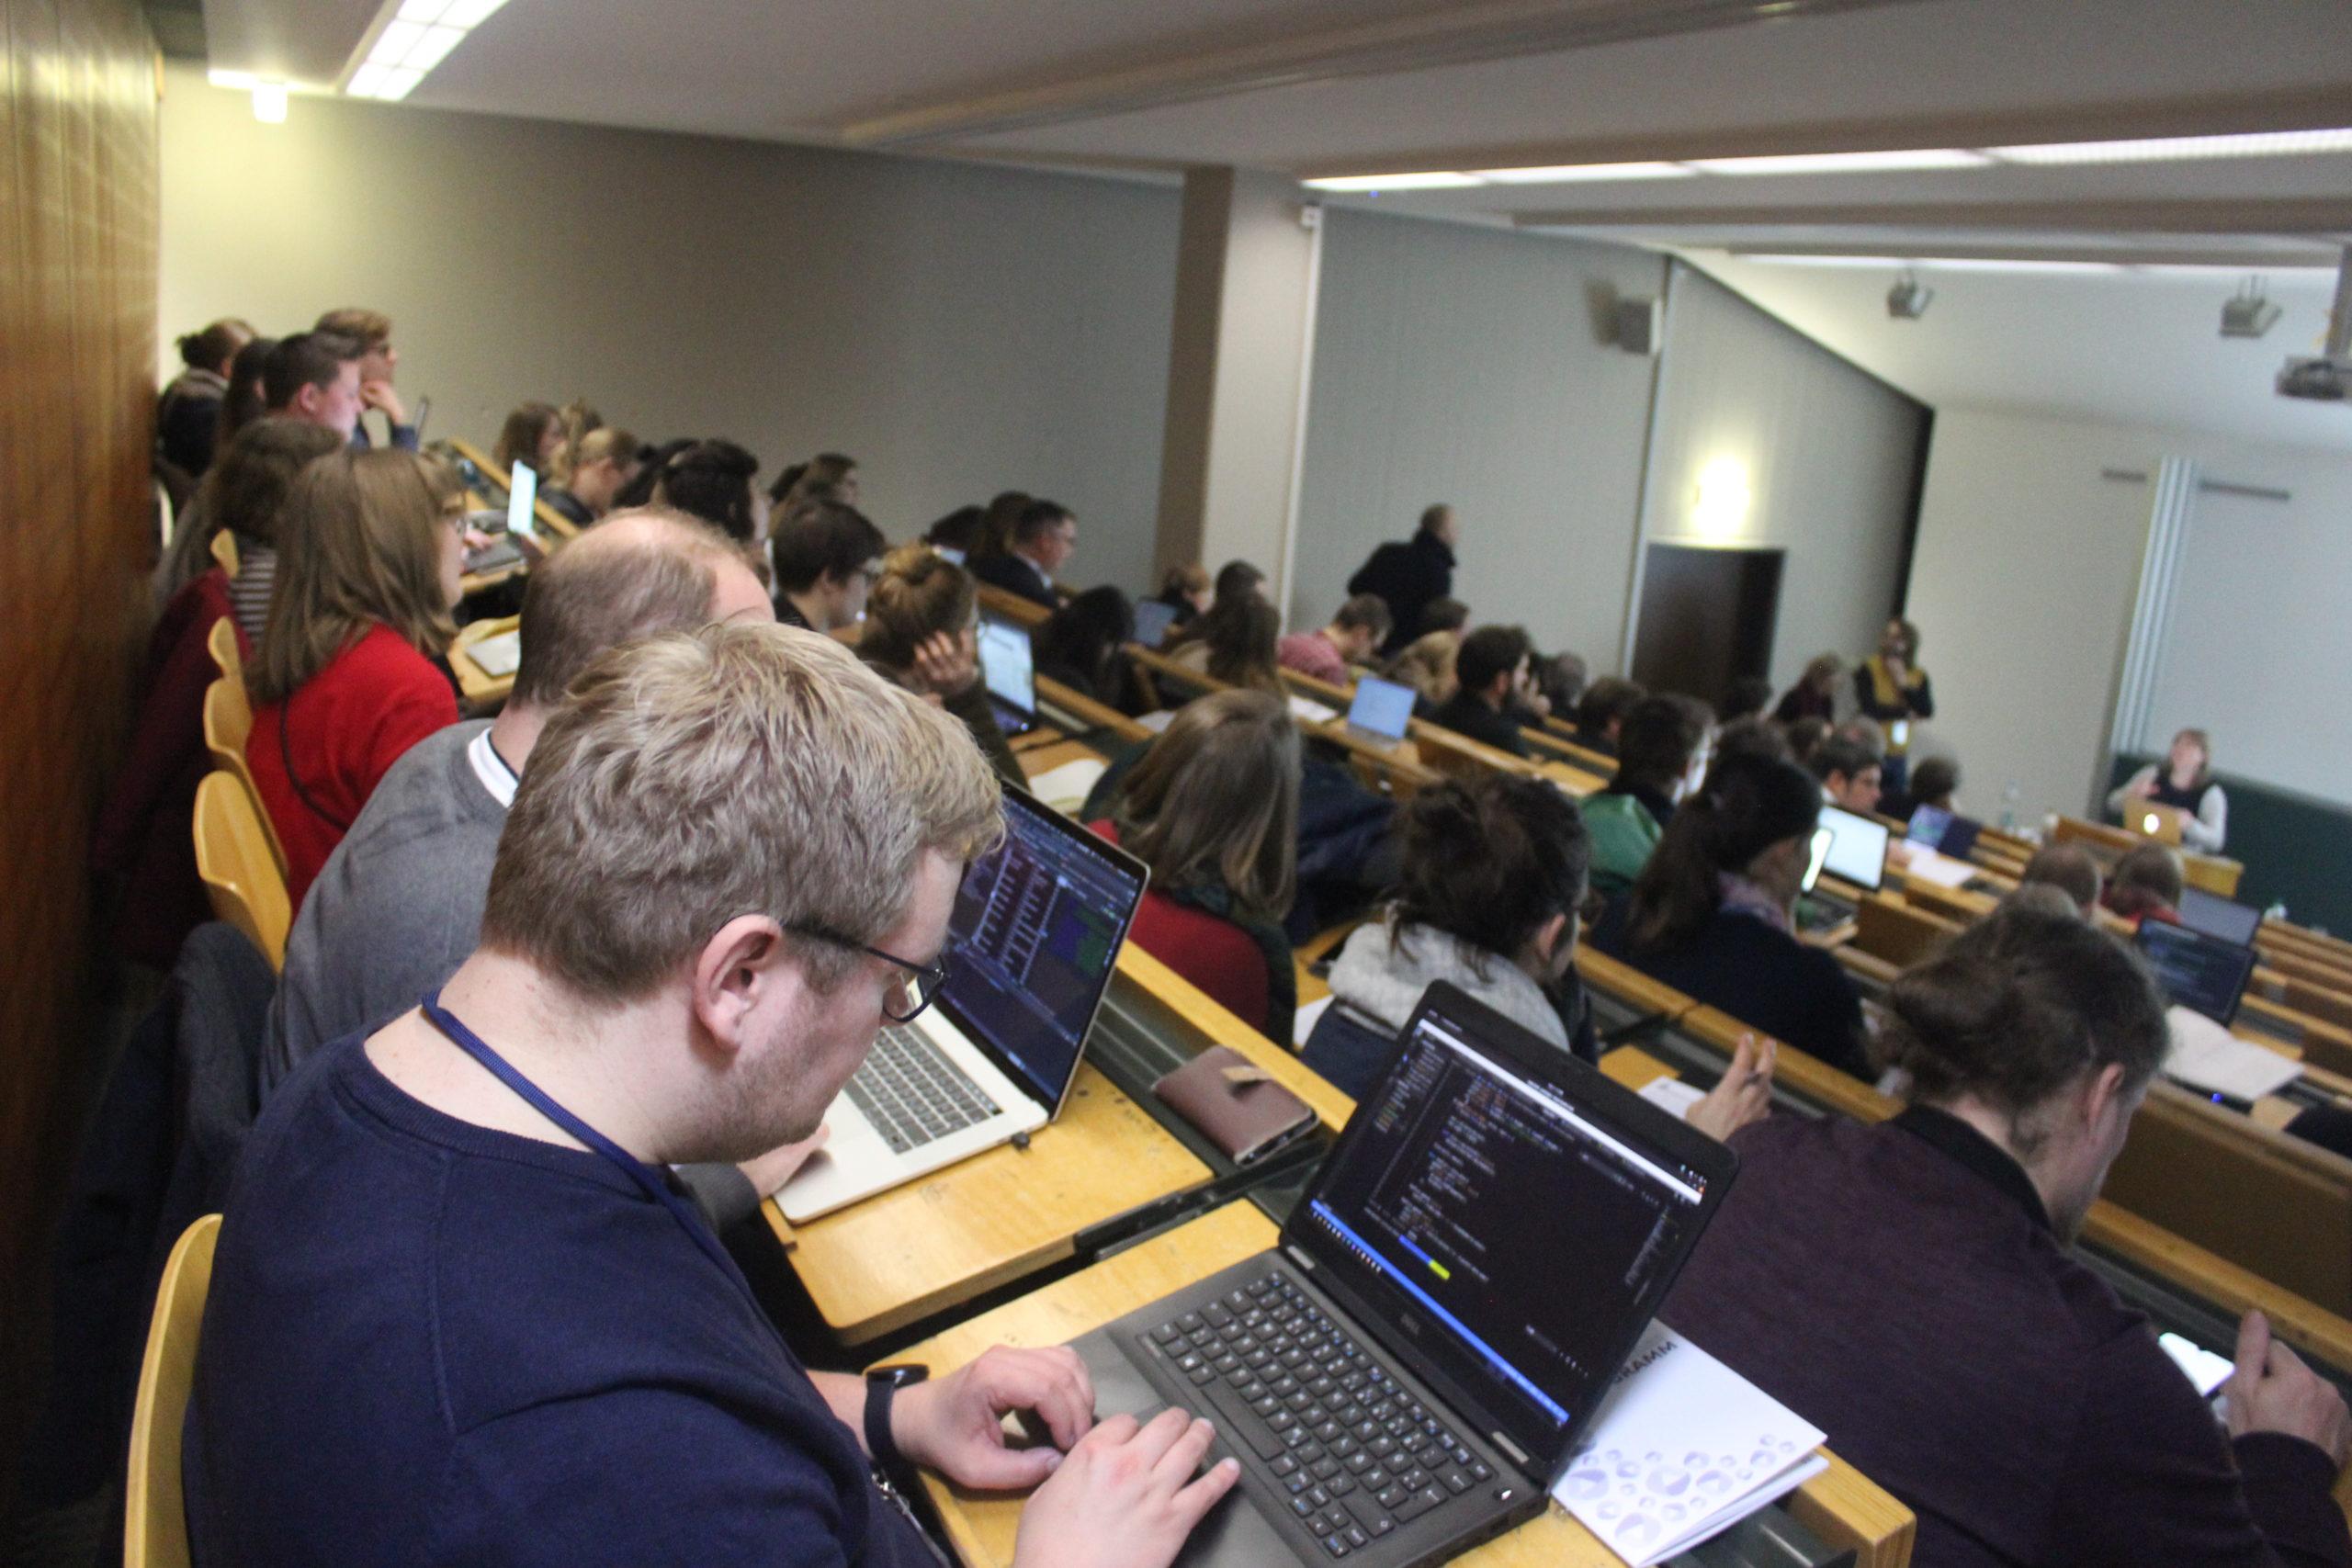 Foto: Josua Köhler/Universität Paderborn, CC BY 3.0 DE